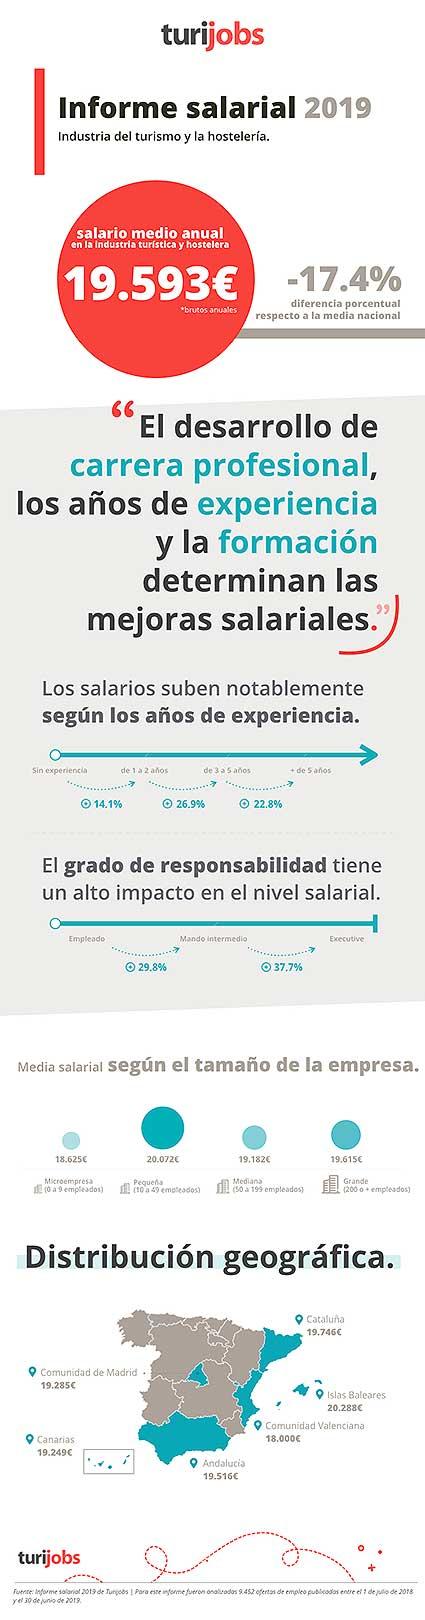 reporte_salarial_2019_turijobs